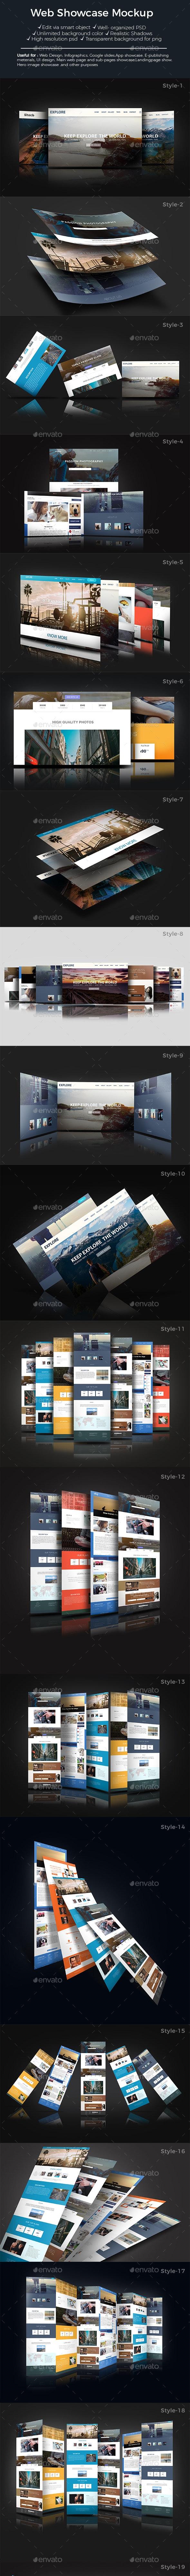 Web Showcase Mockup - Product Mock-Ups Graphics